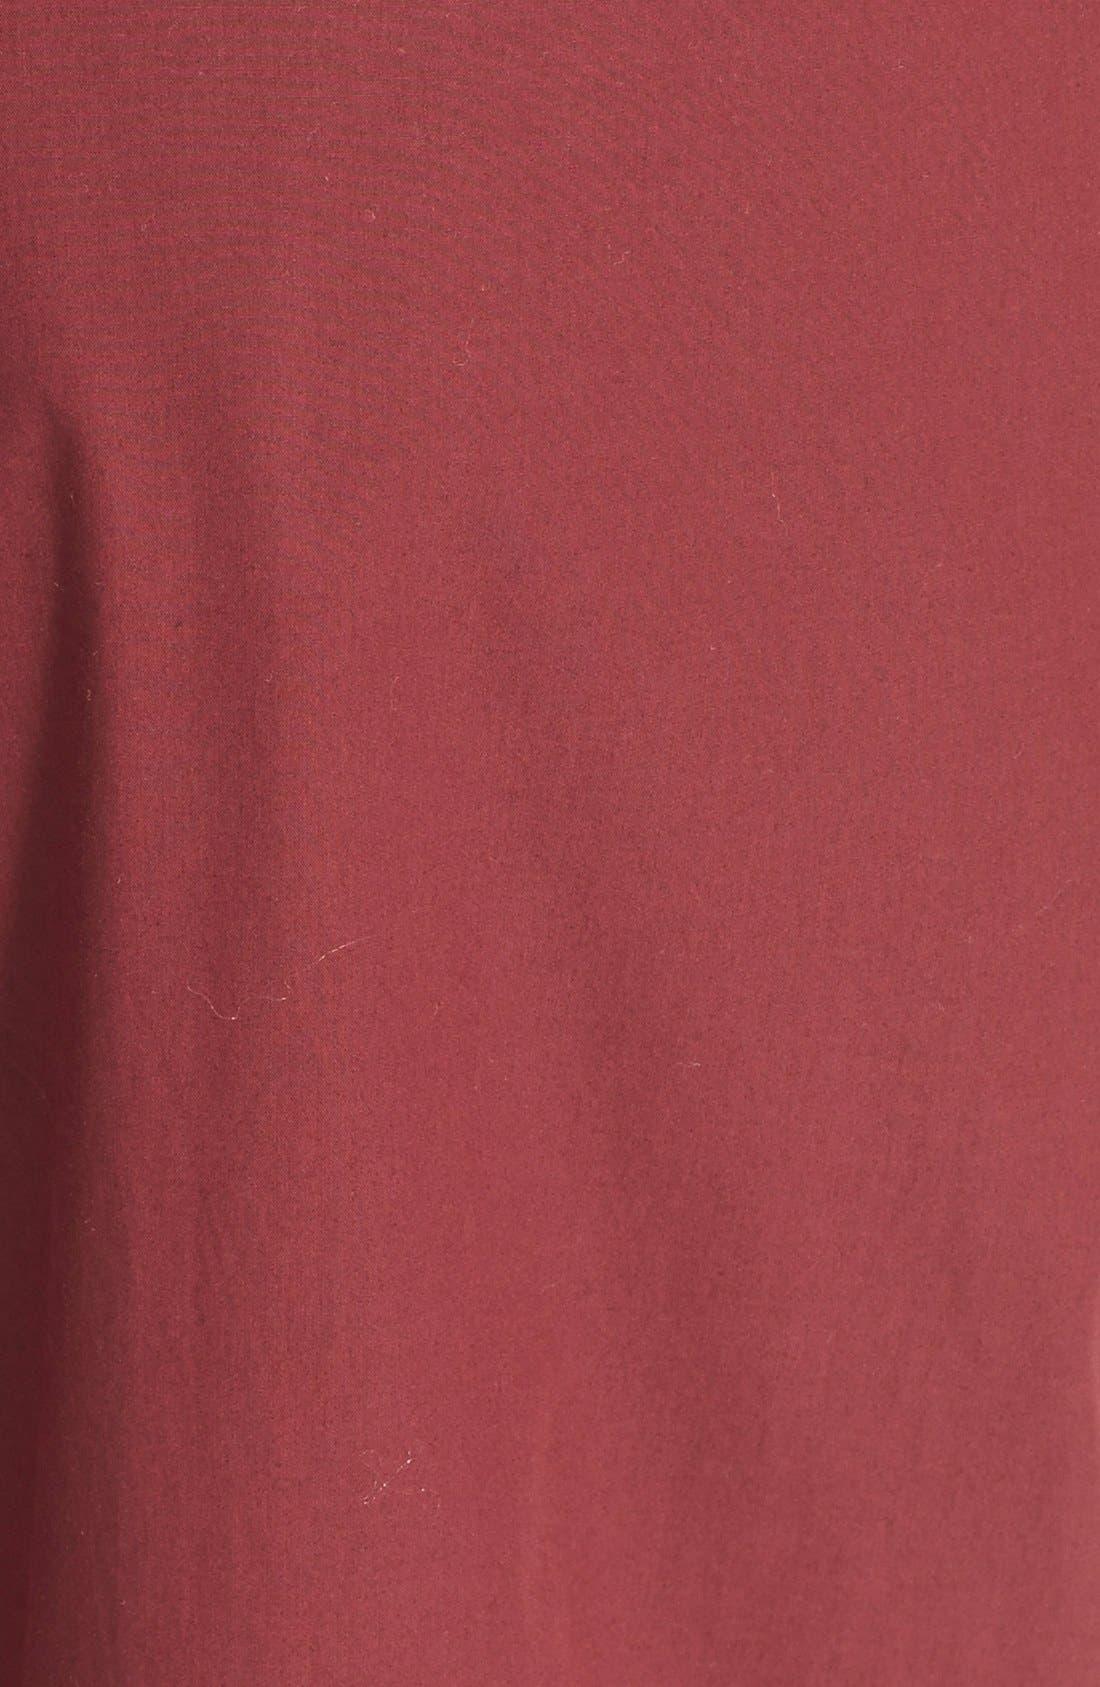 Alternate Image 3  - ACNE Studios 'Onno Pop' Suit Trousers